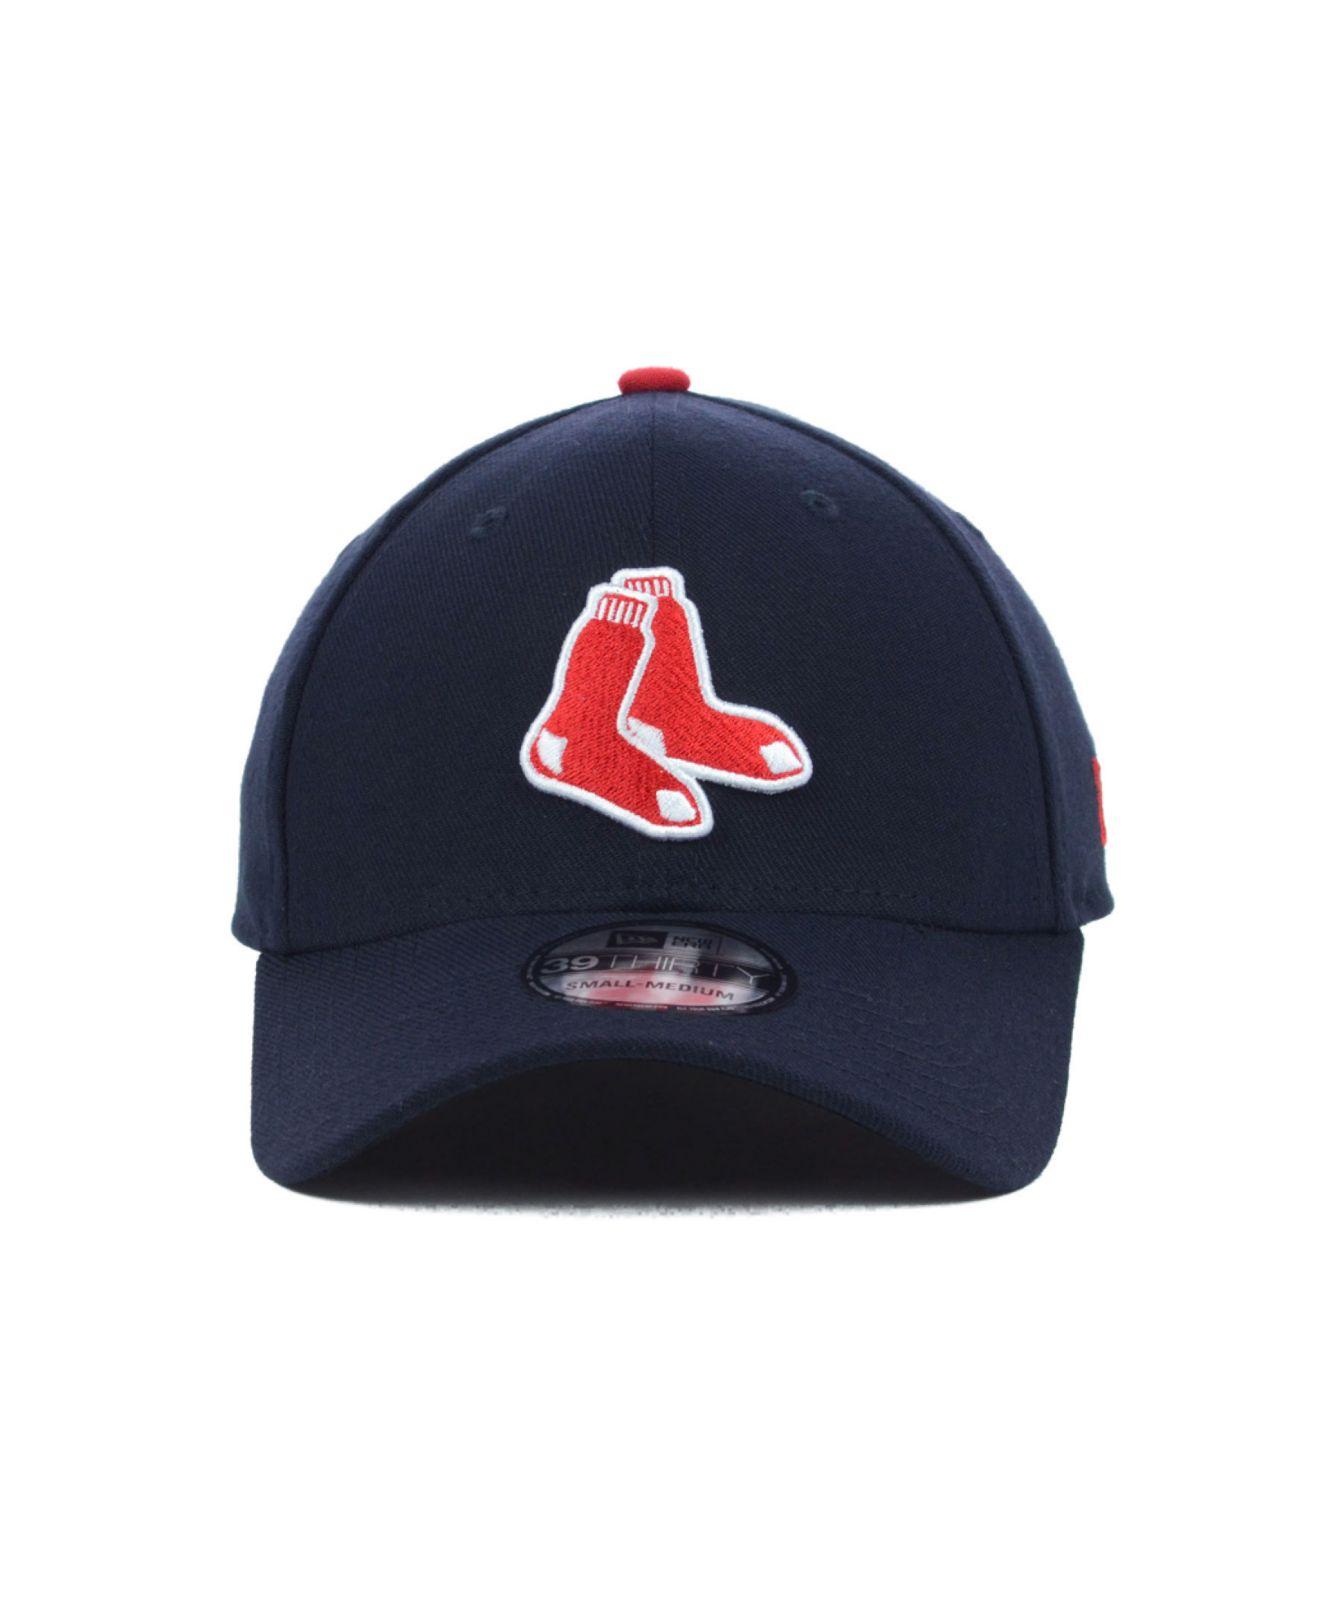 Lyst - KTZ Boston Red Sox Mlb Team Classic 39Thirty Cap in Blue for Men 8b673401abf